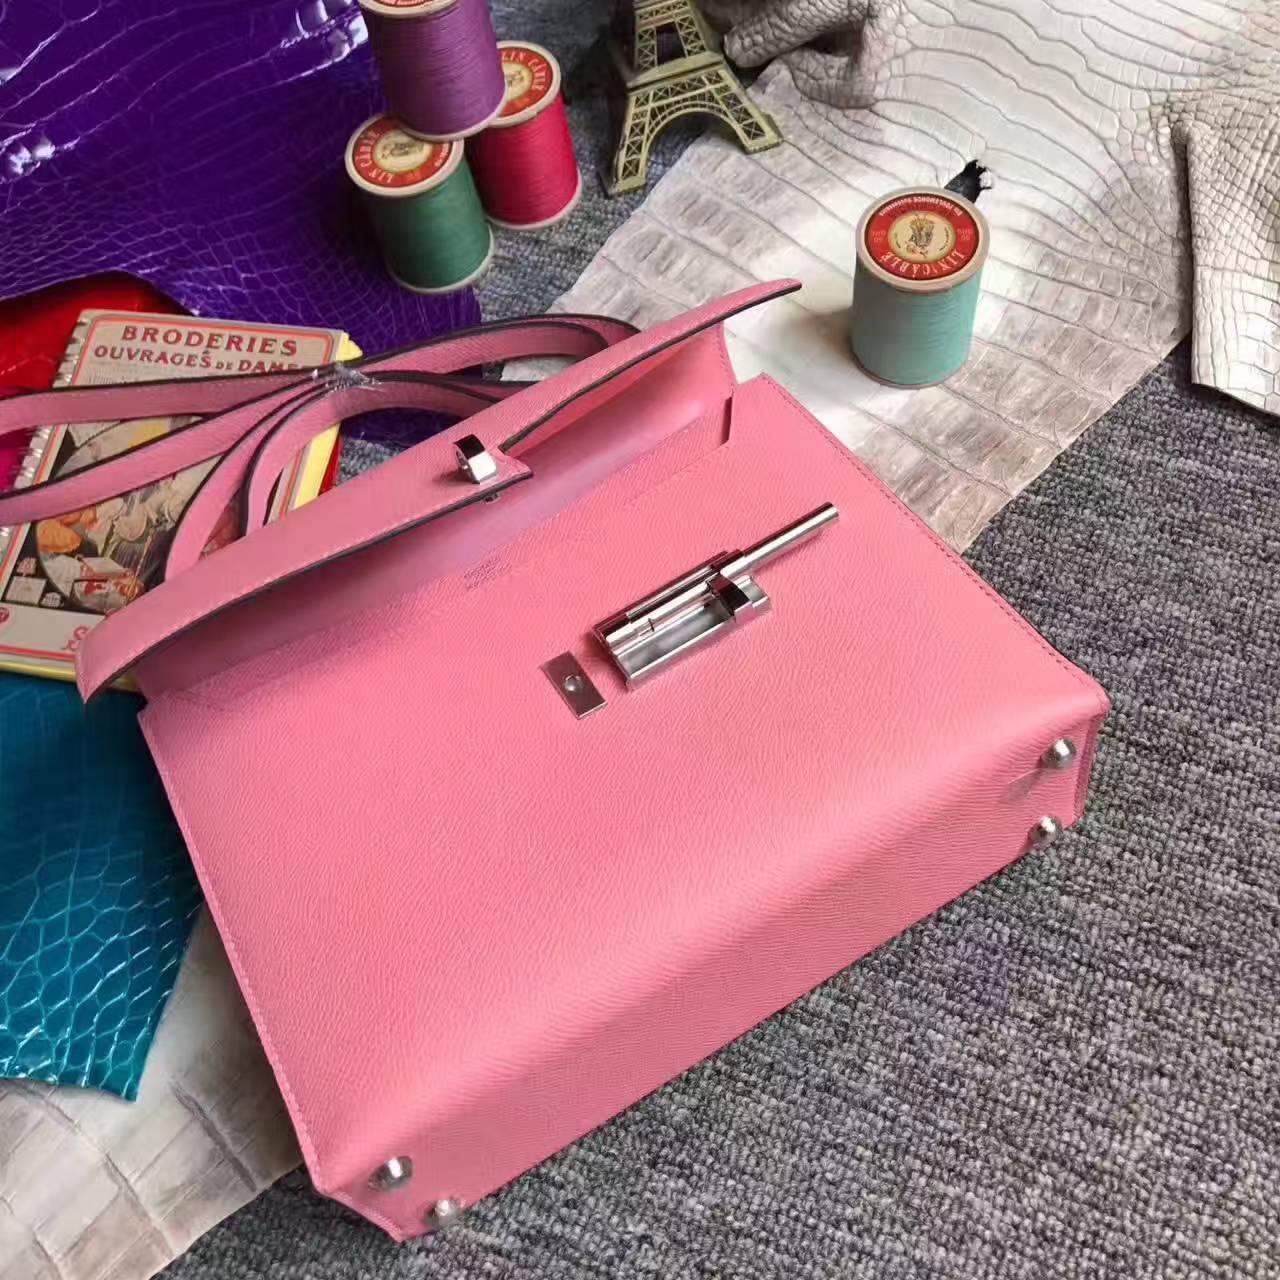 Hand Stitching Hermes Verrou Bag 24cm in 1Q Rose Confetti Epsom Leather